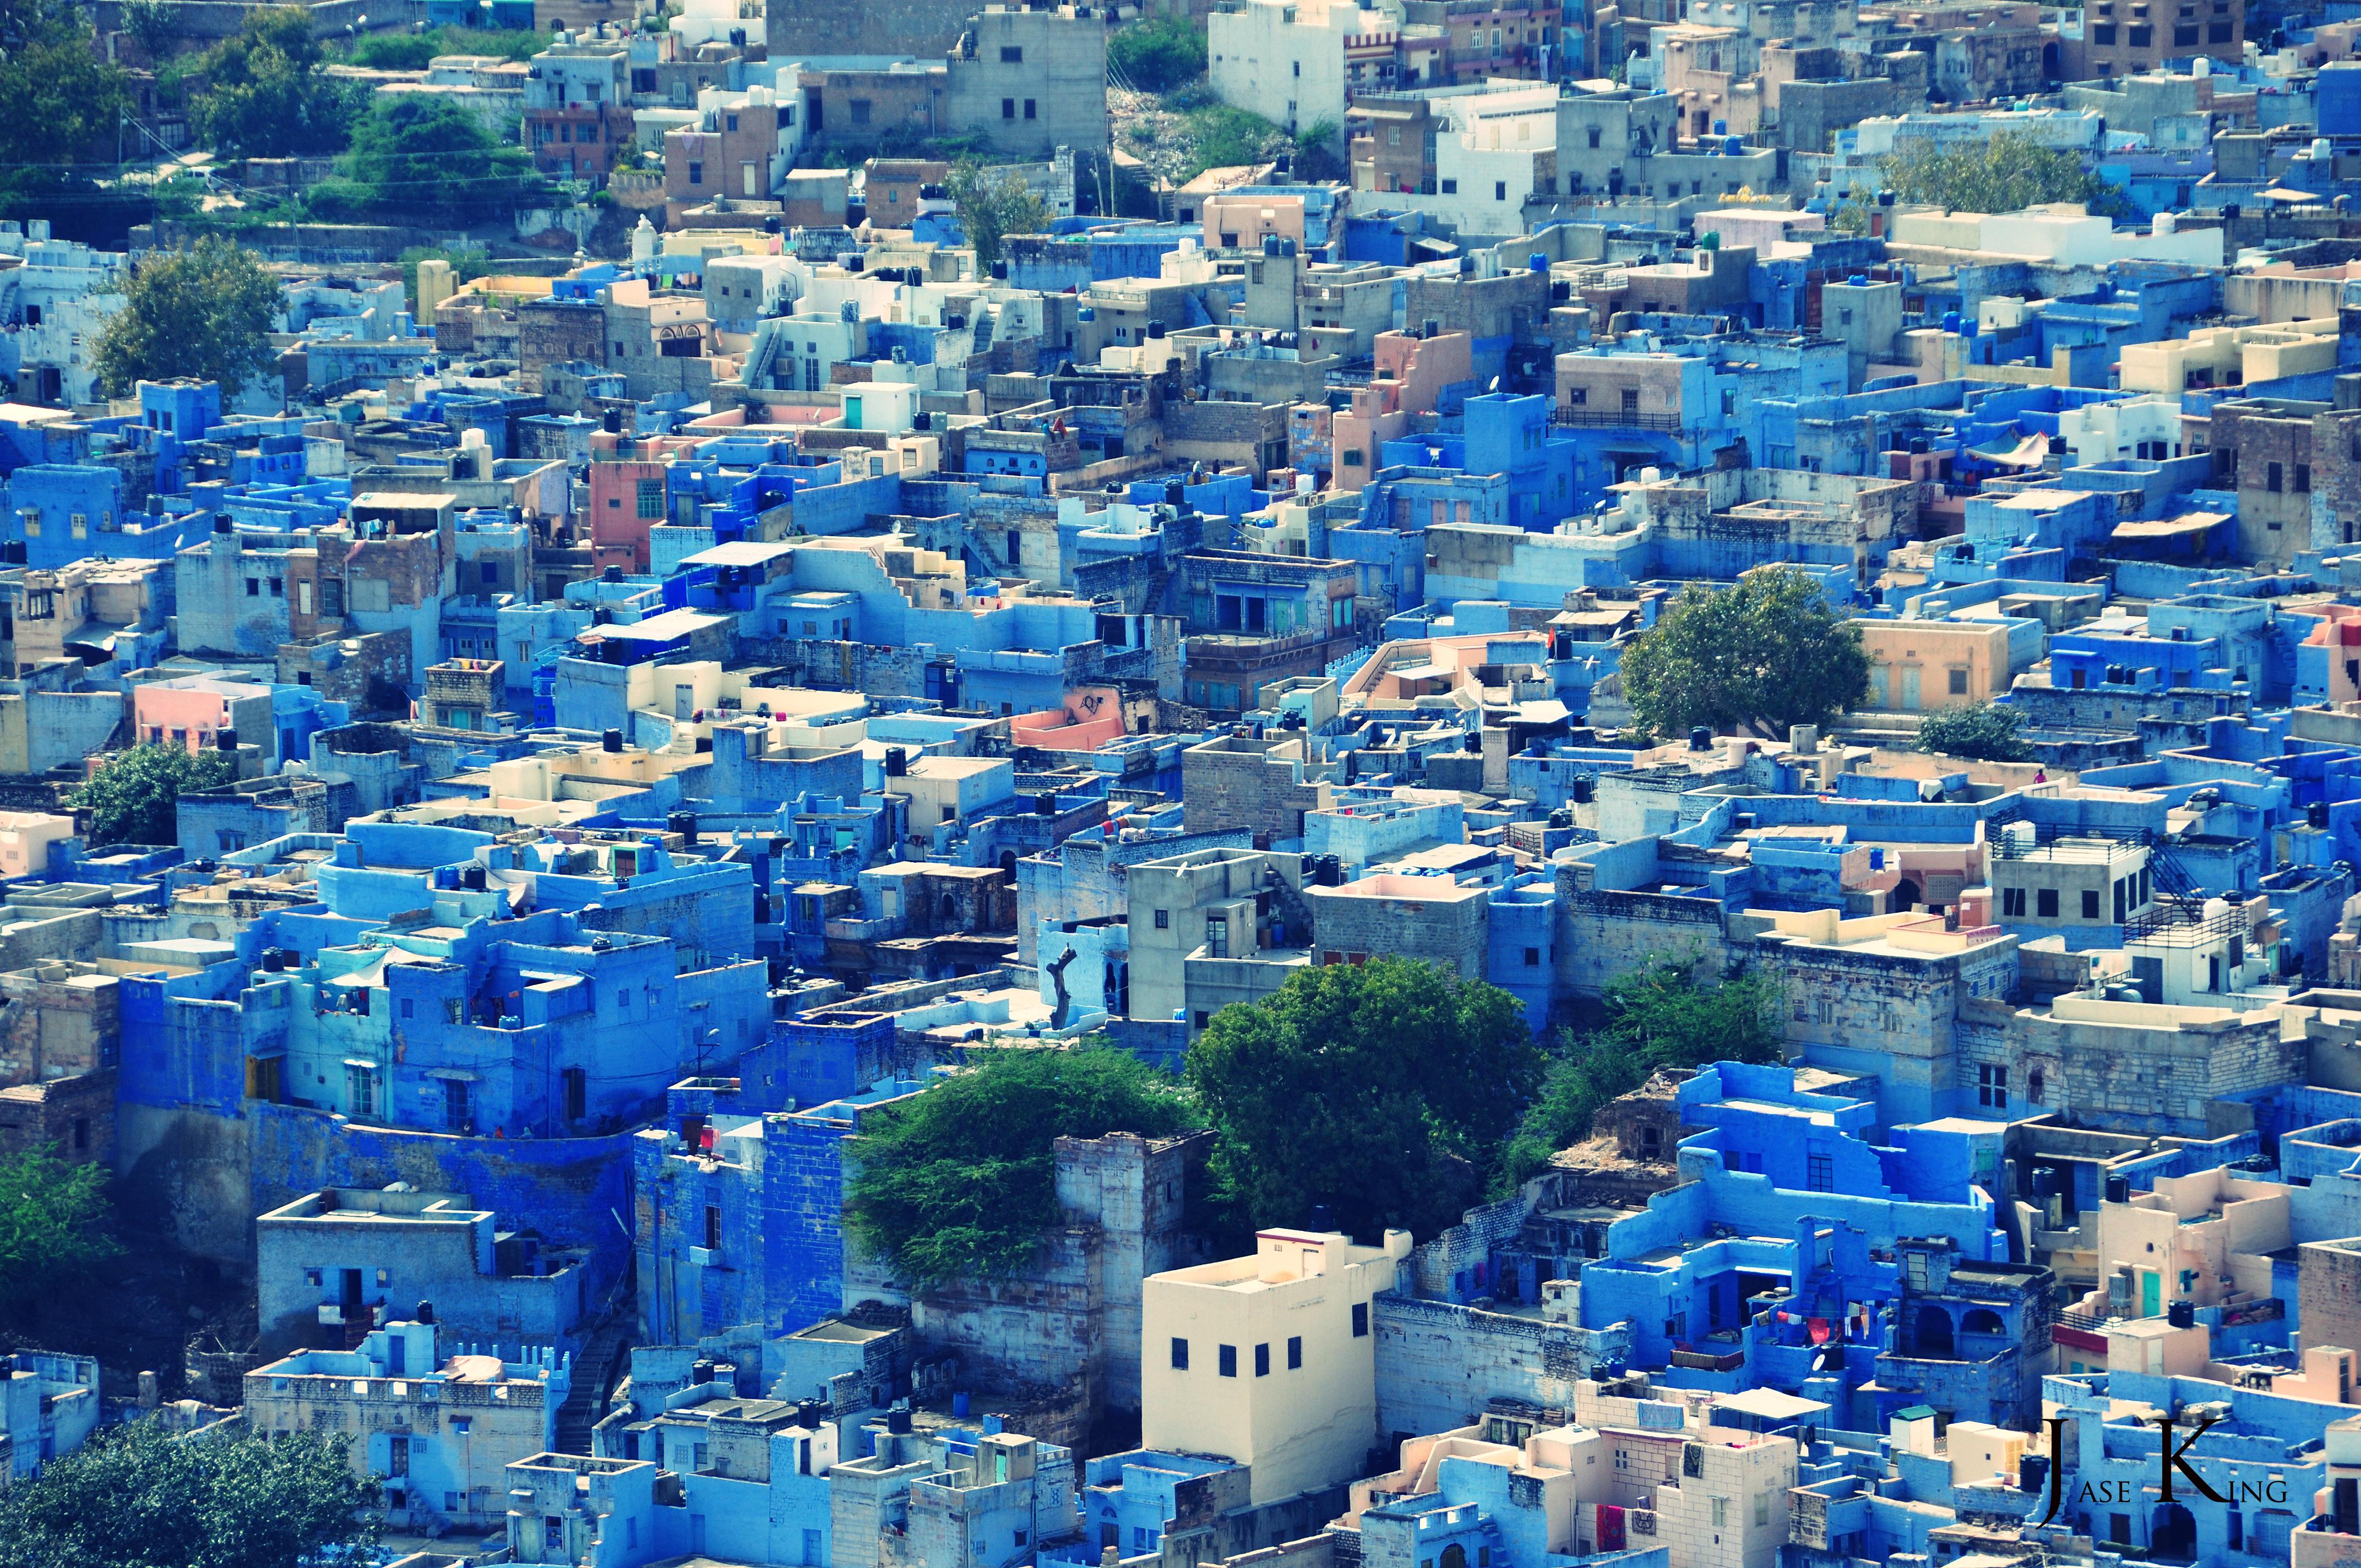 Moments in Jodhpur and Jaipur while traversing through Rajasthan ...